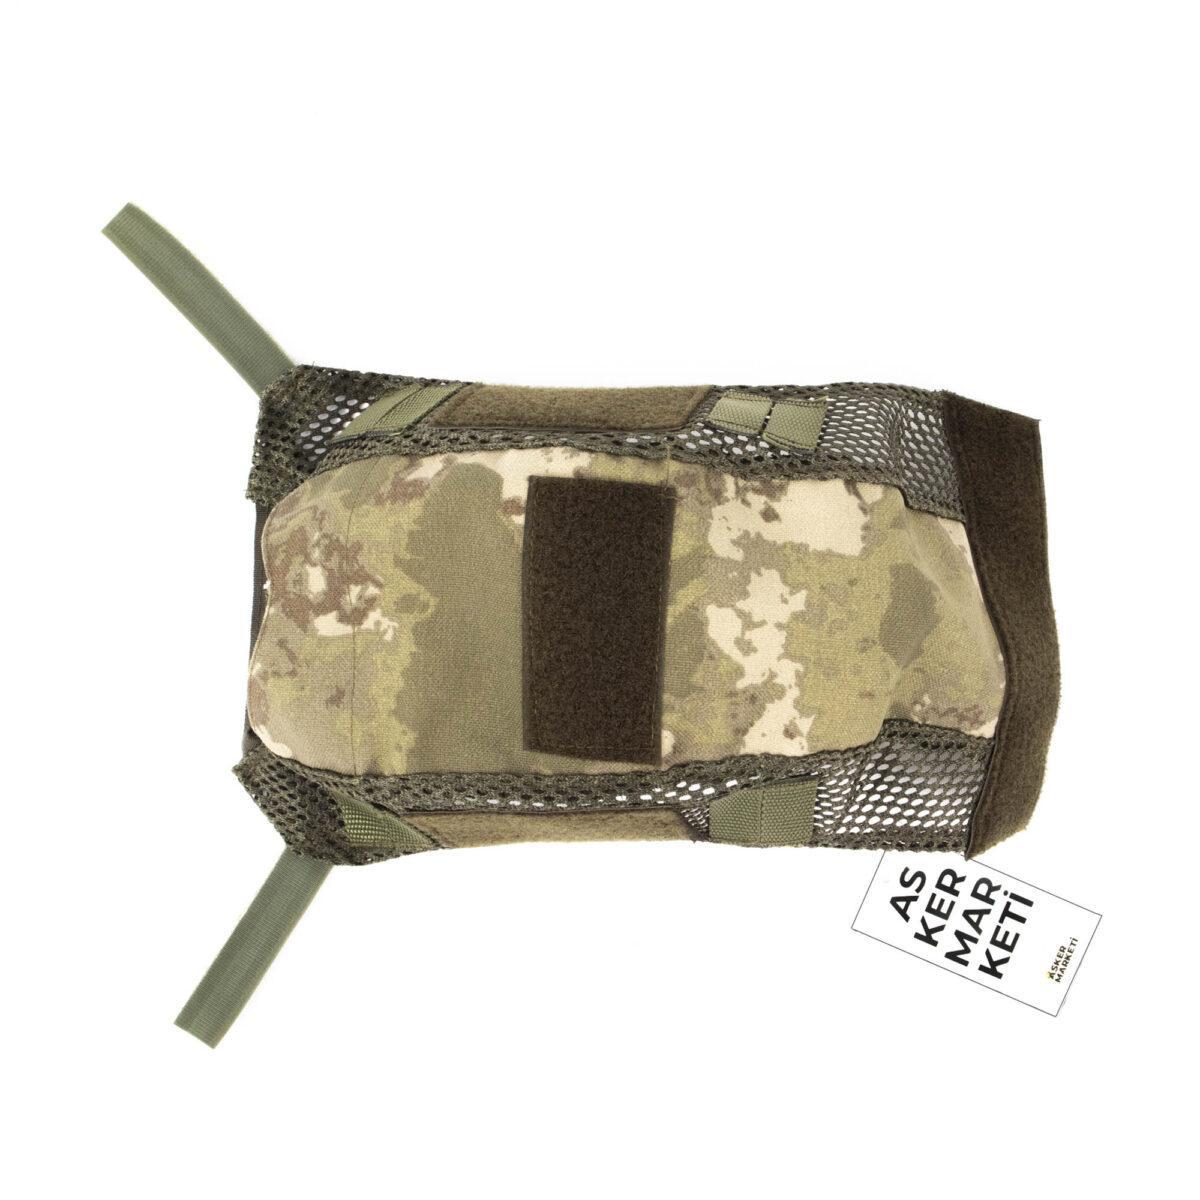 yeni tsk kamuflaj kask kilifi kisa askeri malzeme2